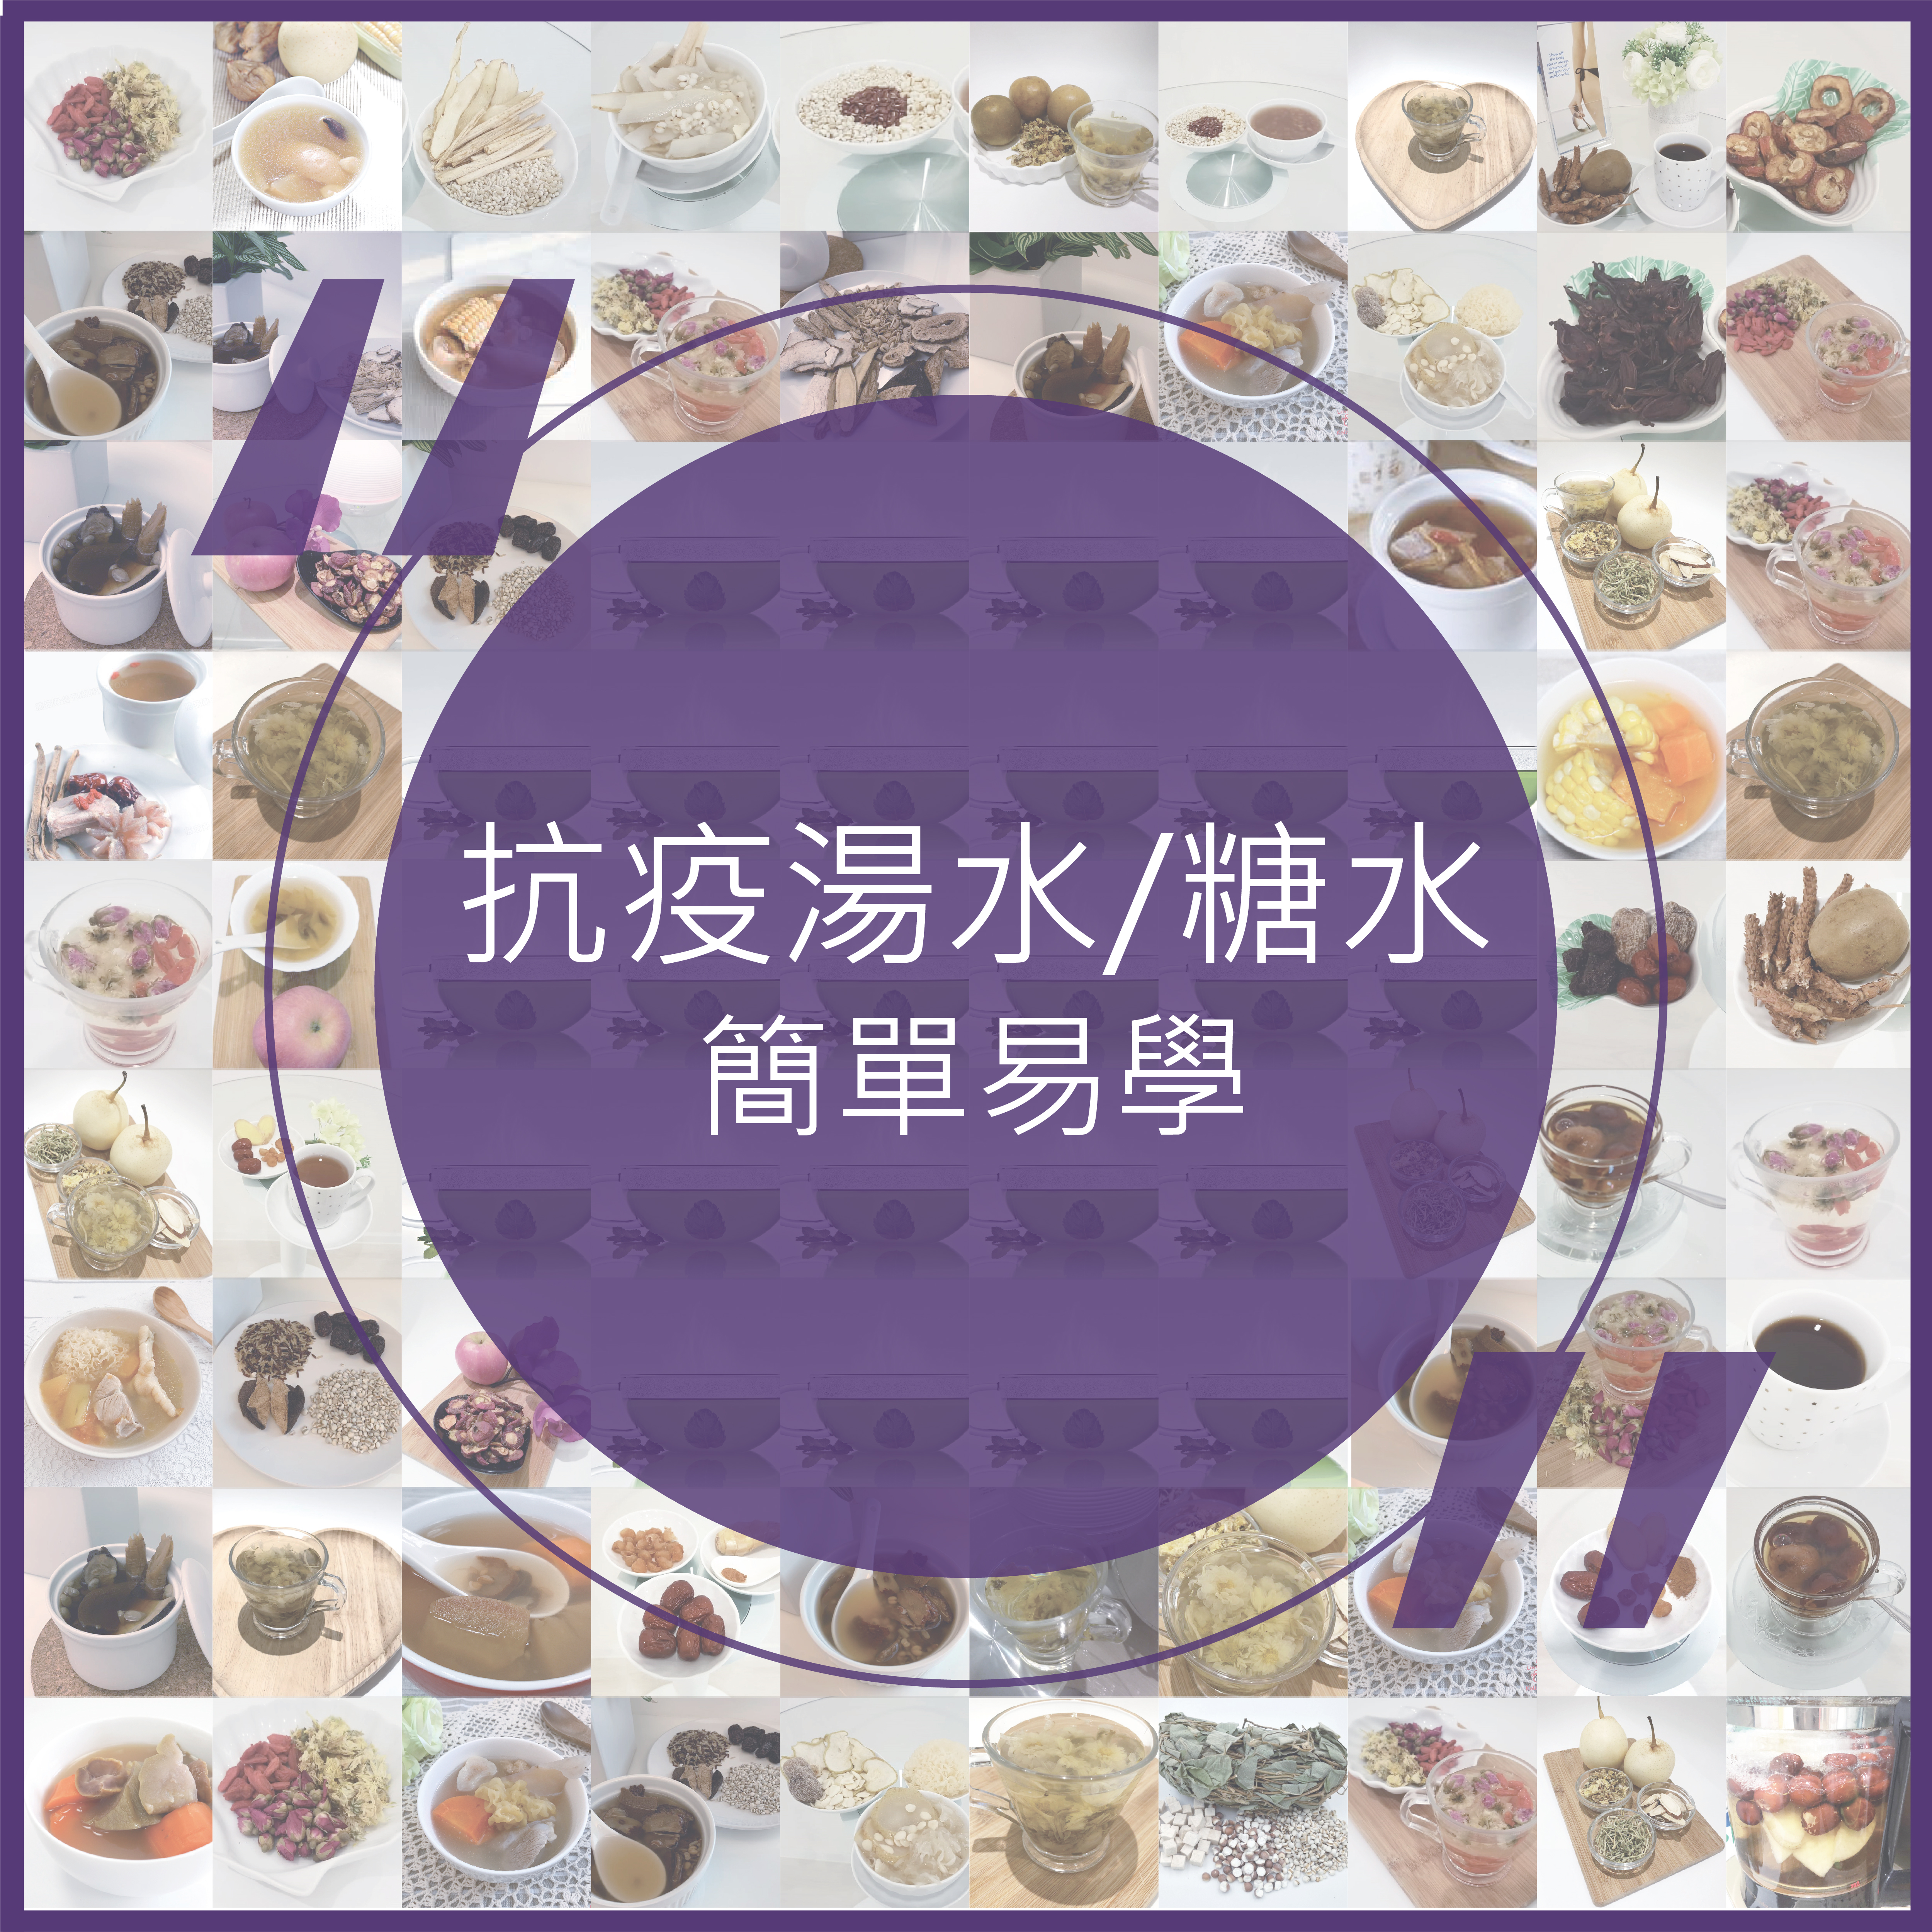 classic beaute Jess Sum沈卓盈純美纖體美容中心-抗疫湯水糖水-website